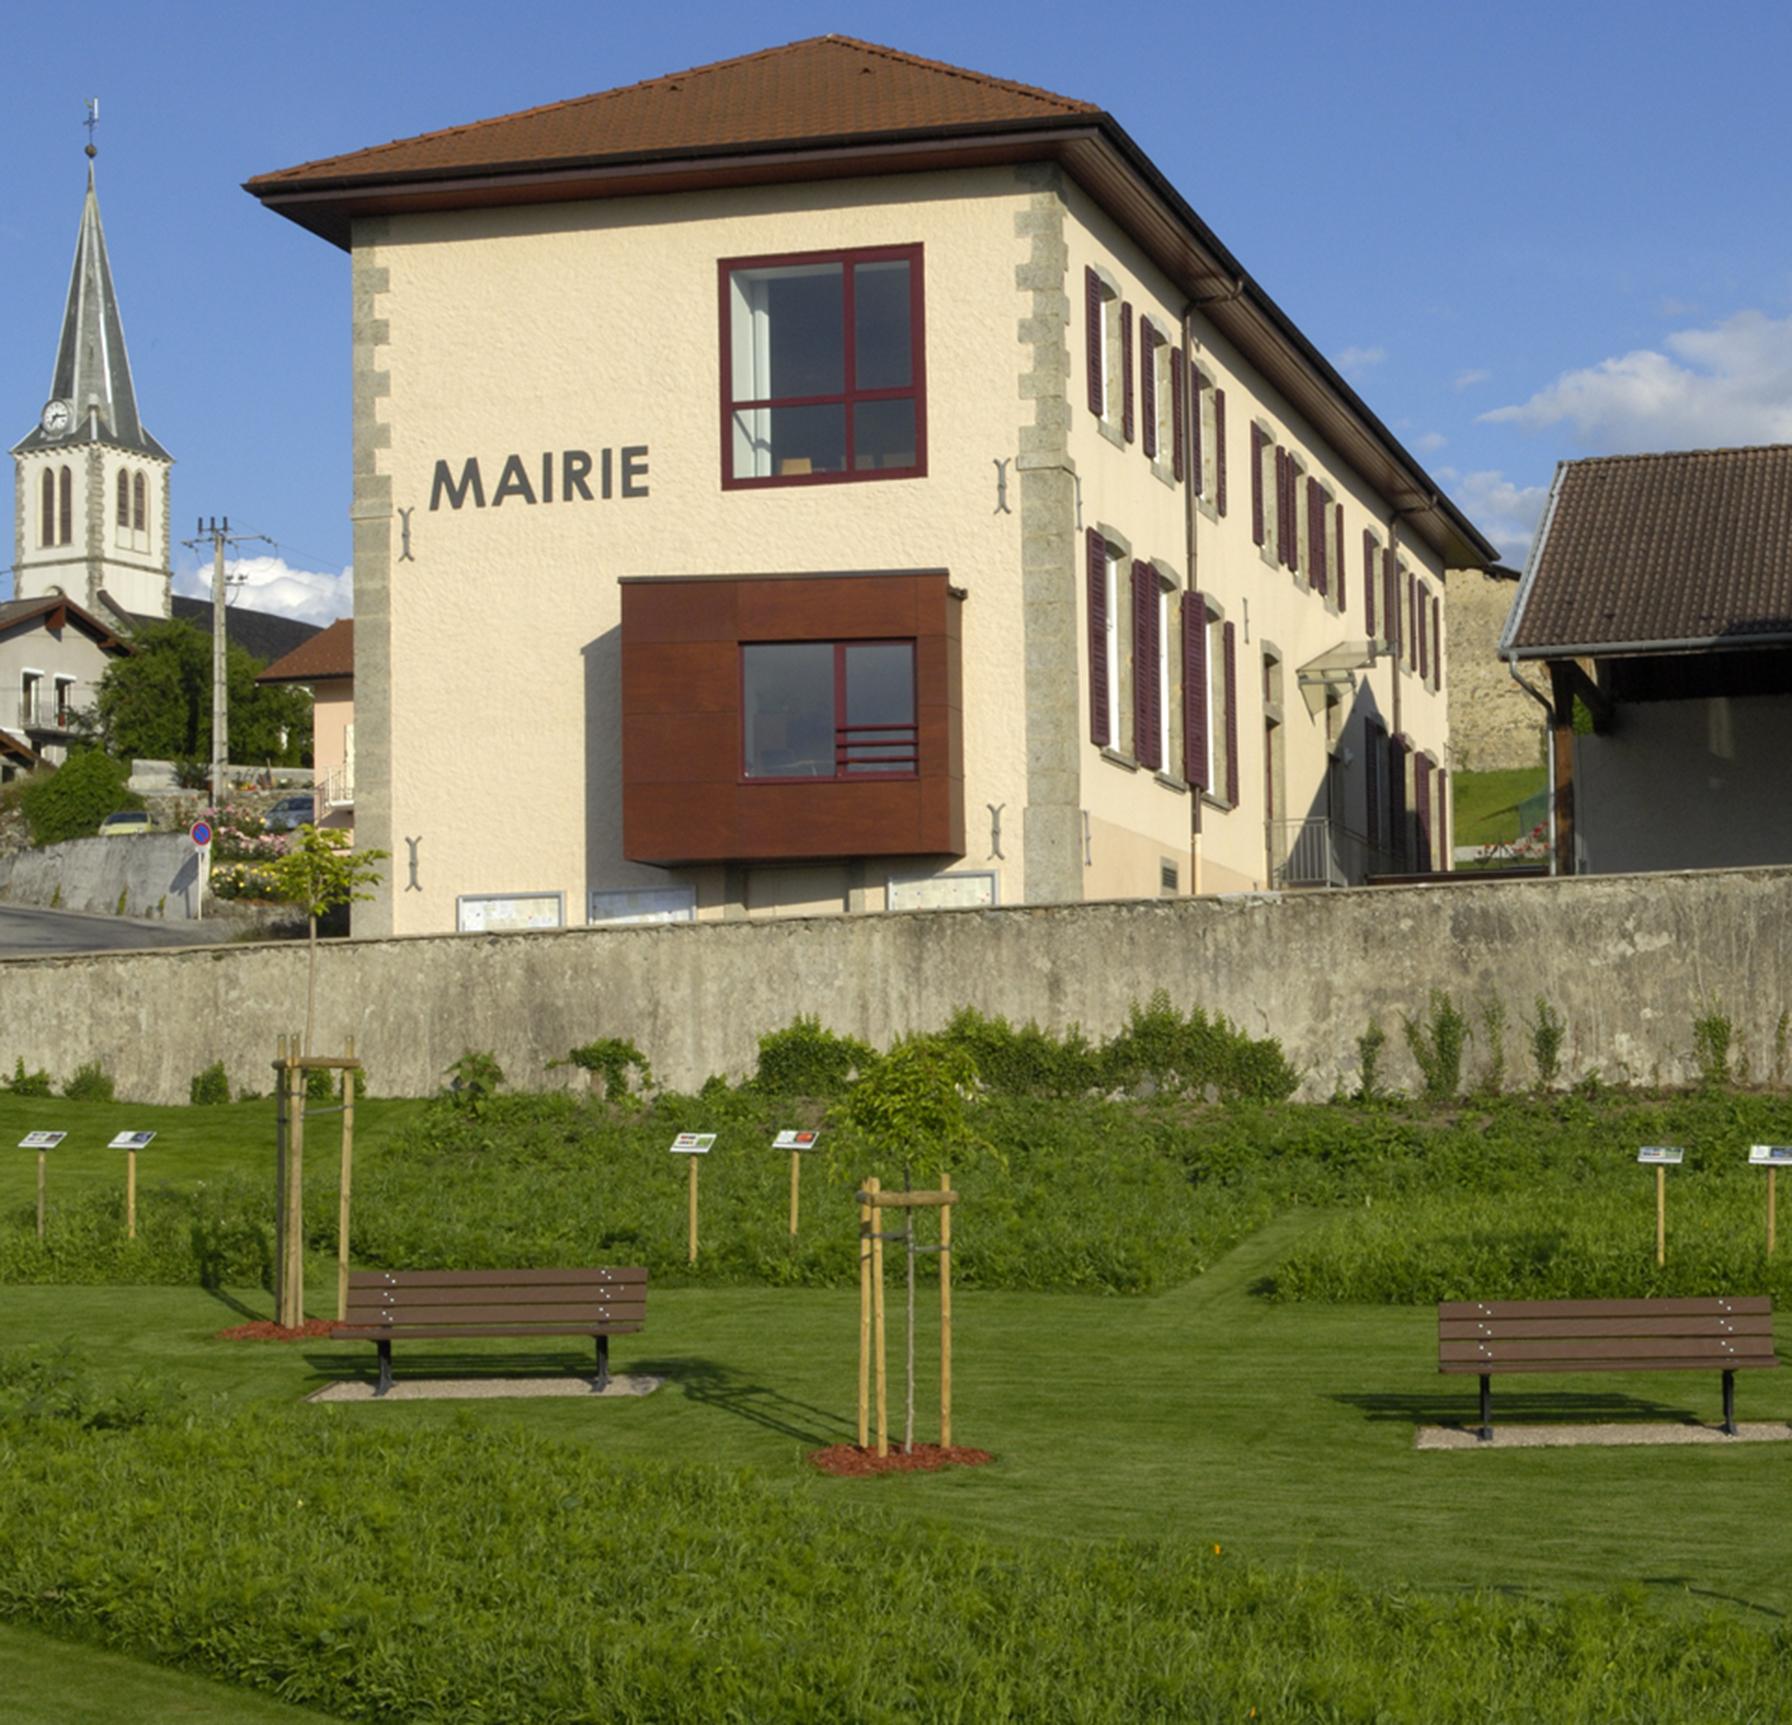 Mairie de MARIN | Architectes GUYOT Nelly - POULAIN Isabelle |